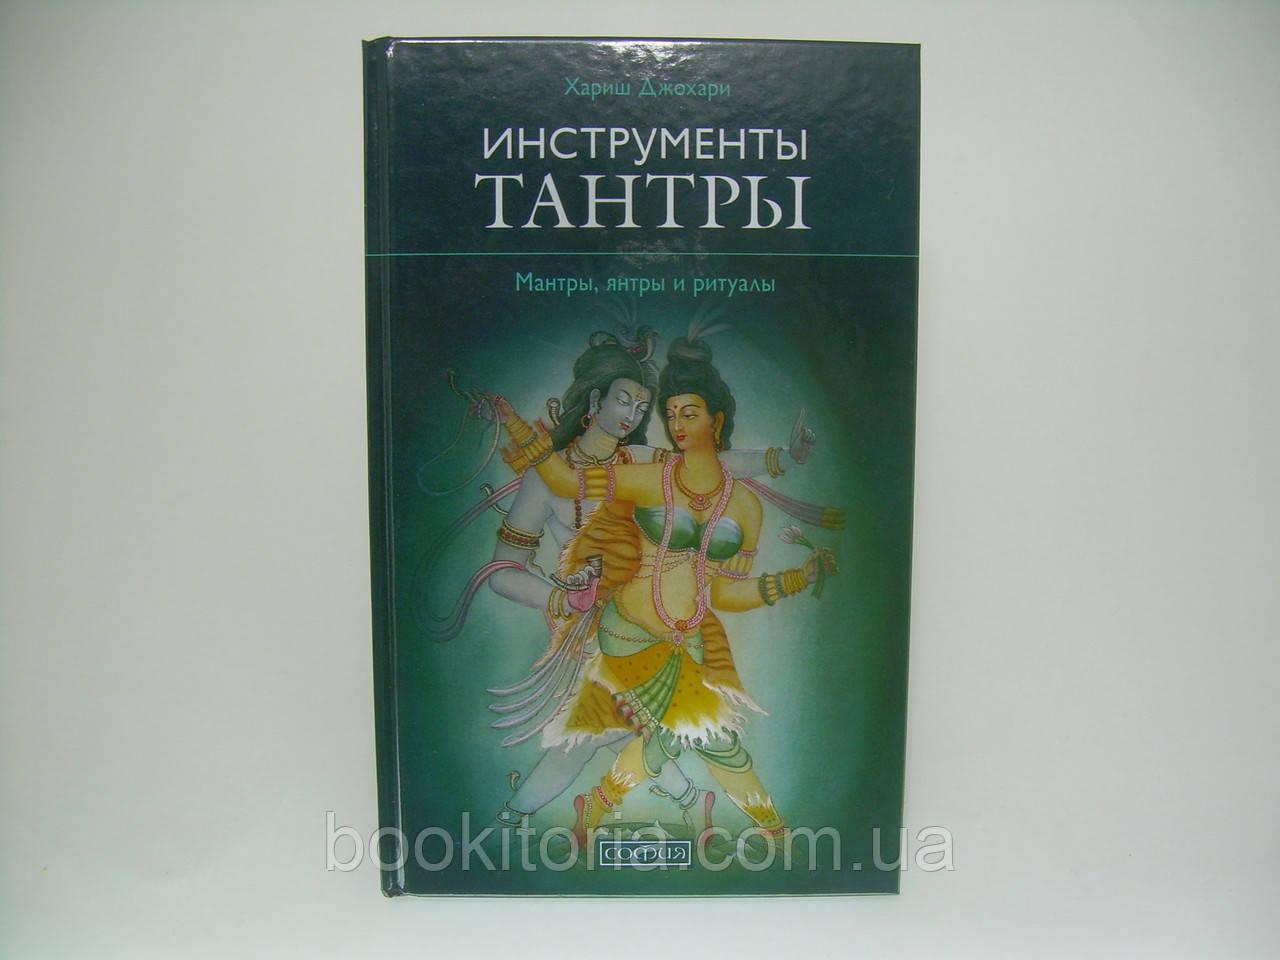 Хариш Д. Инструменты тантры.